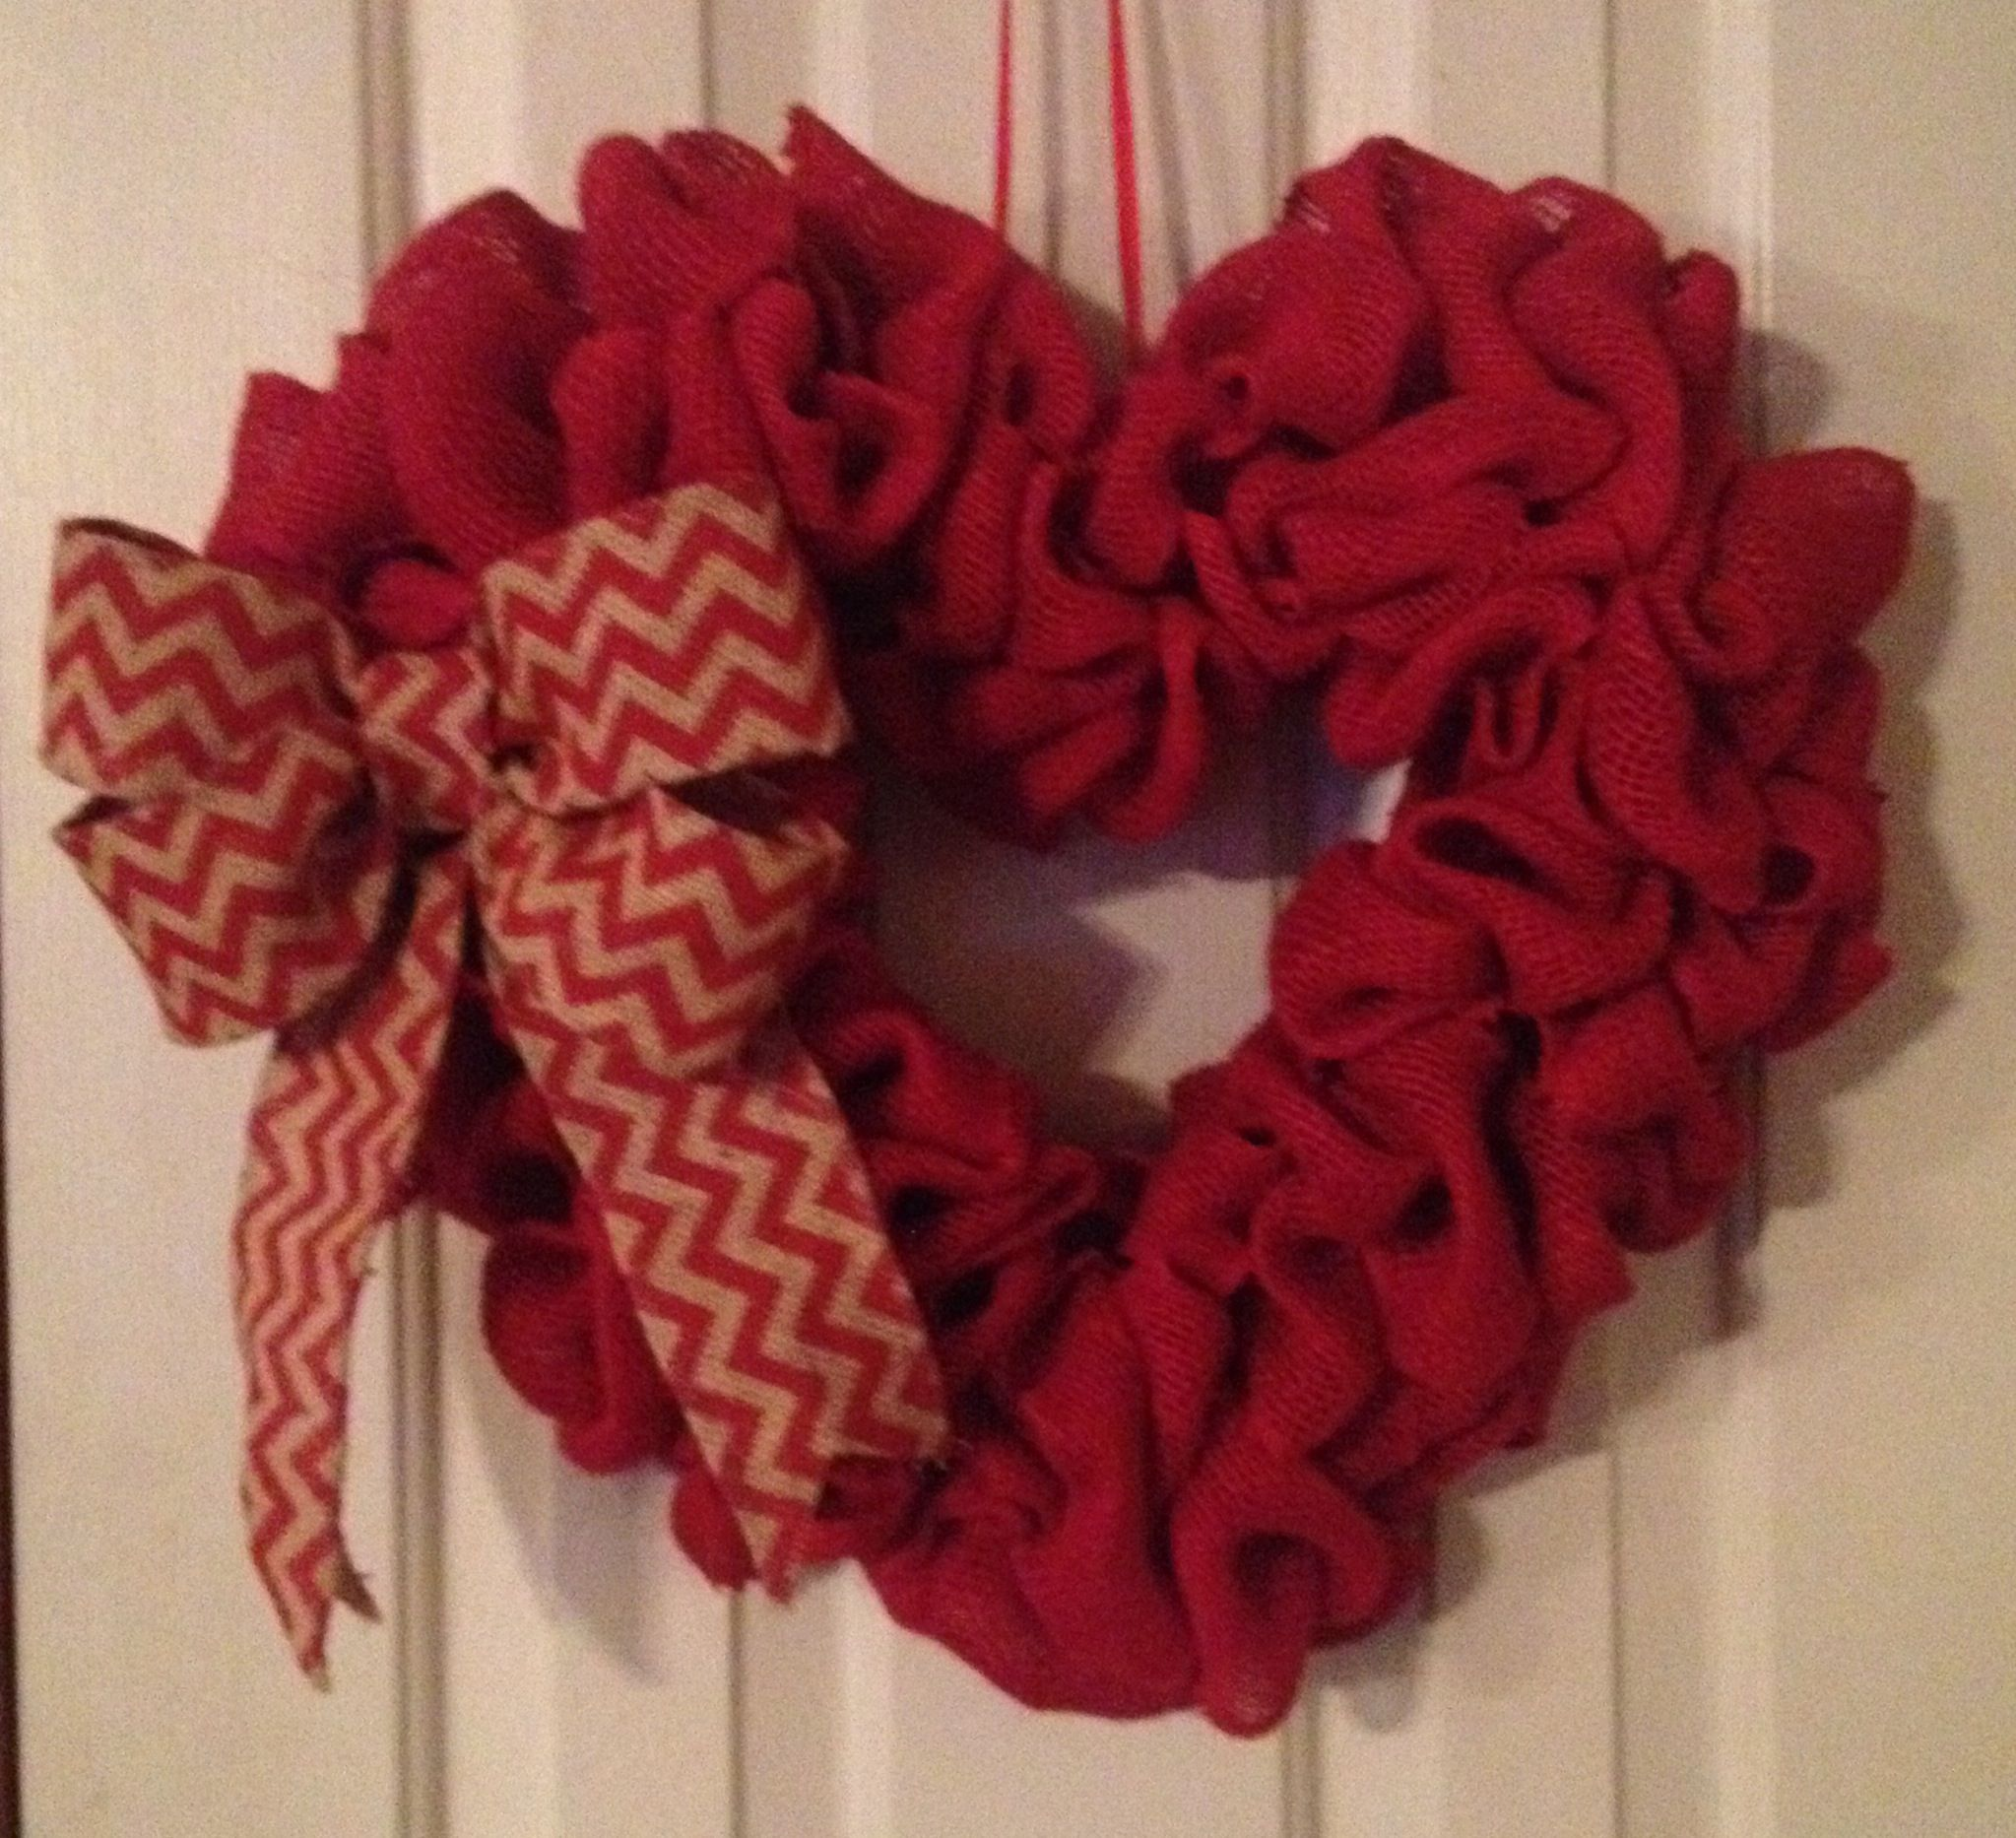 Heart shaped burlap wreath with chevron bow